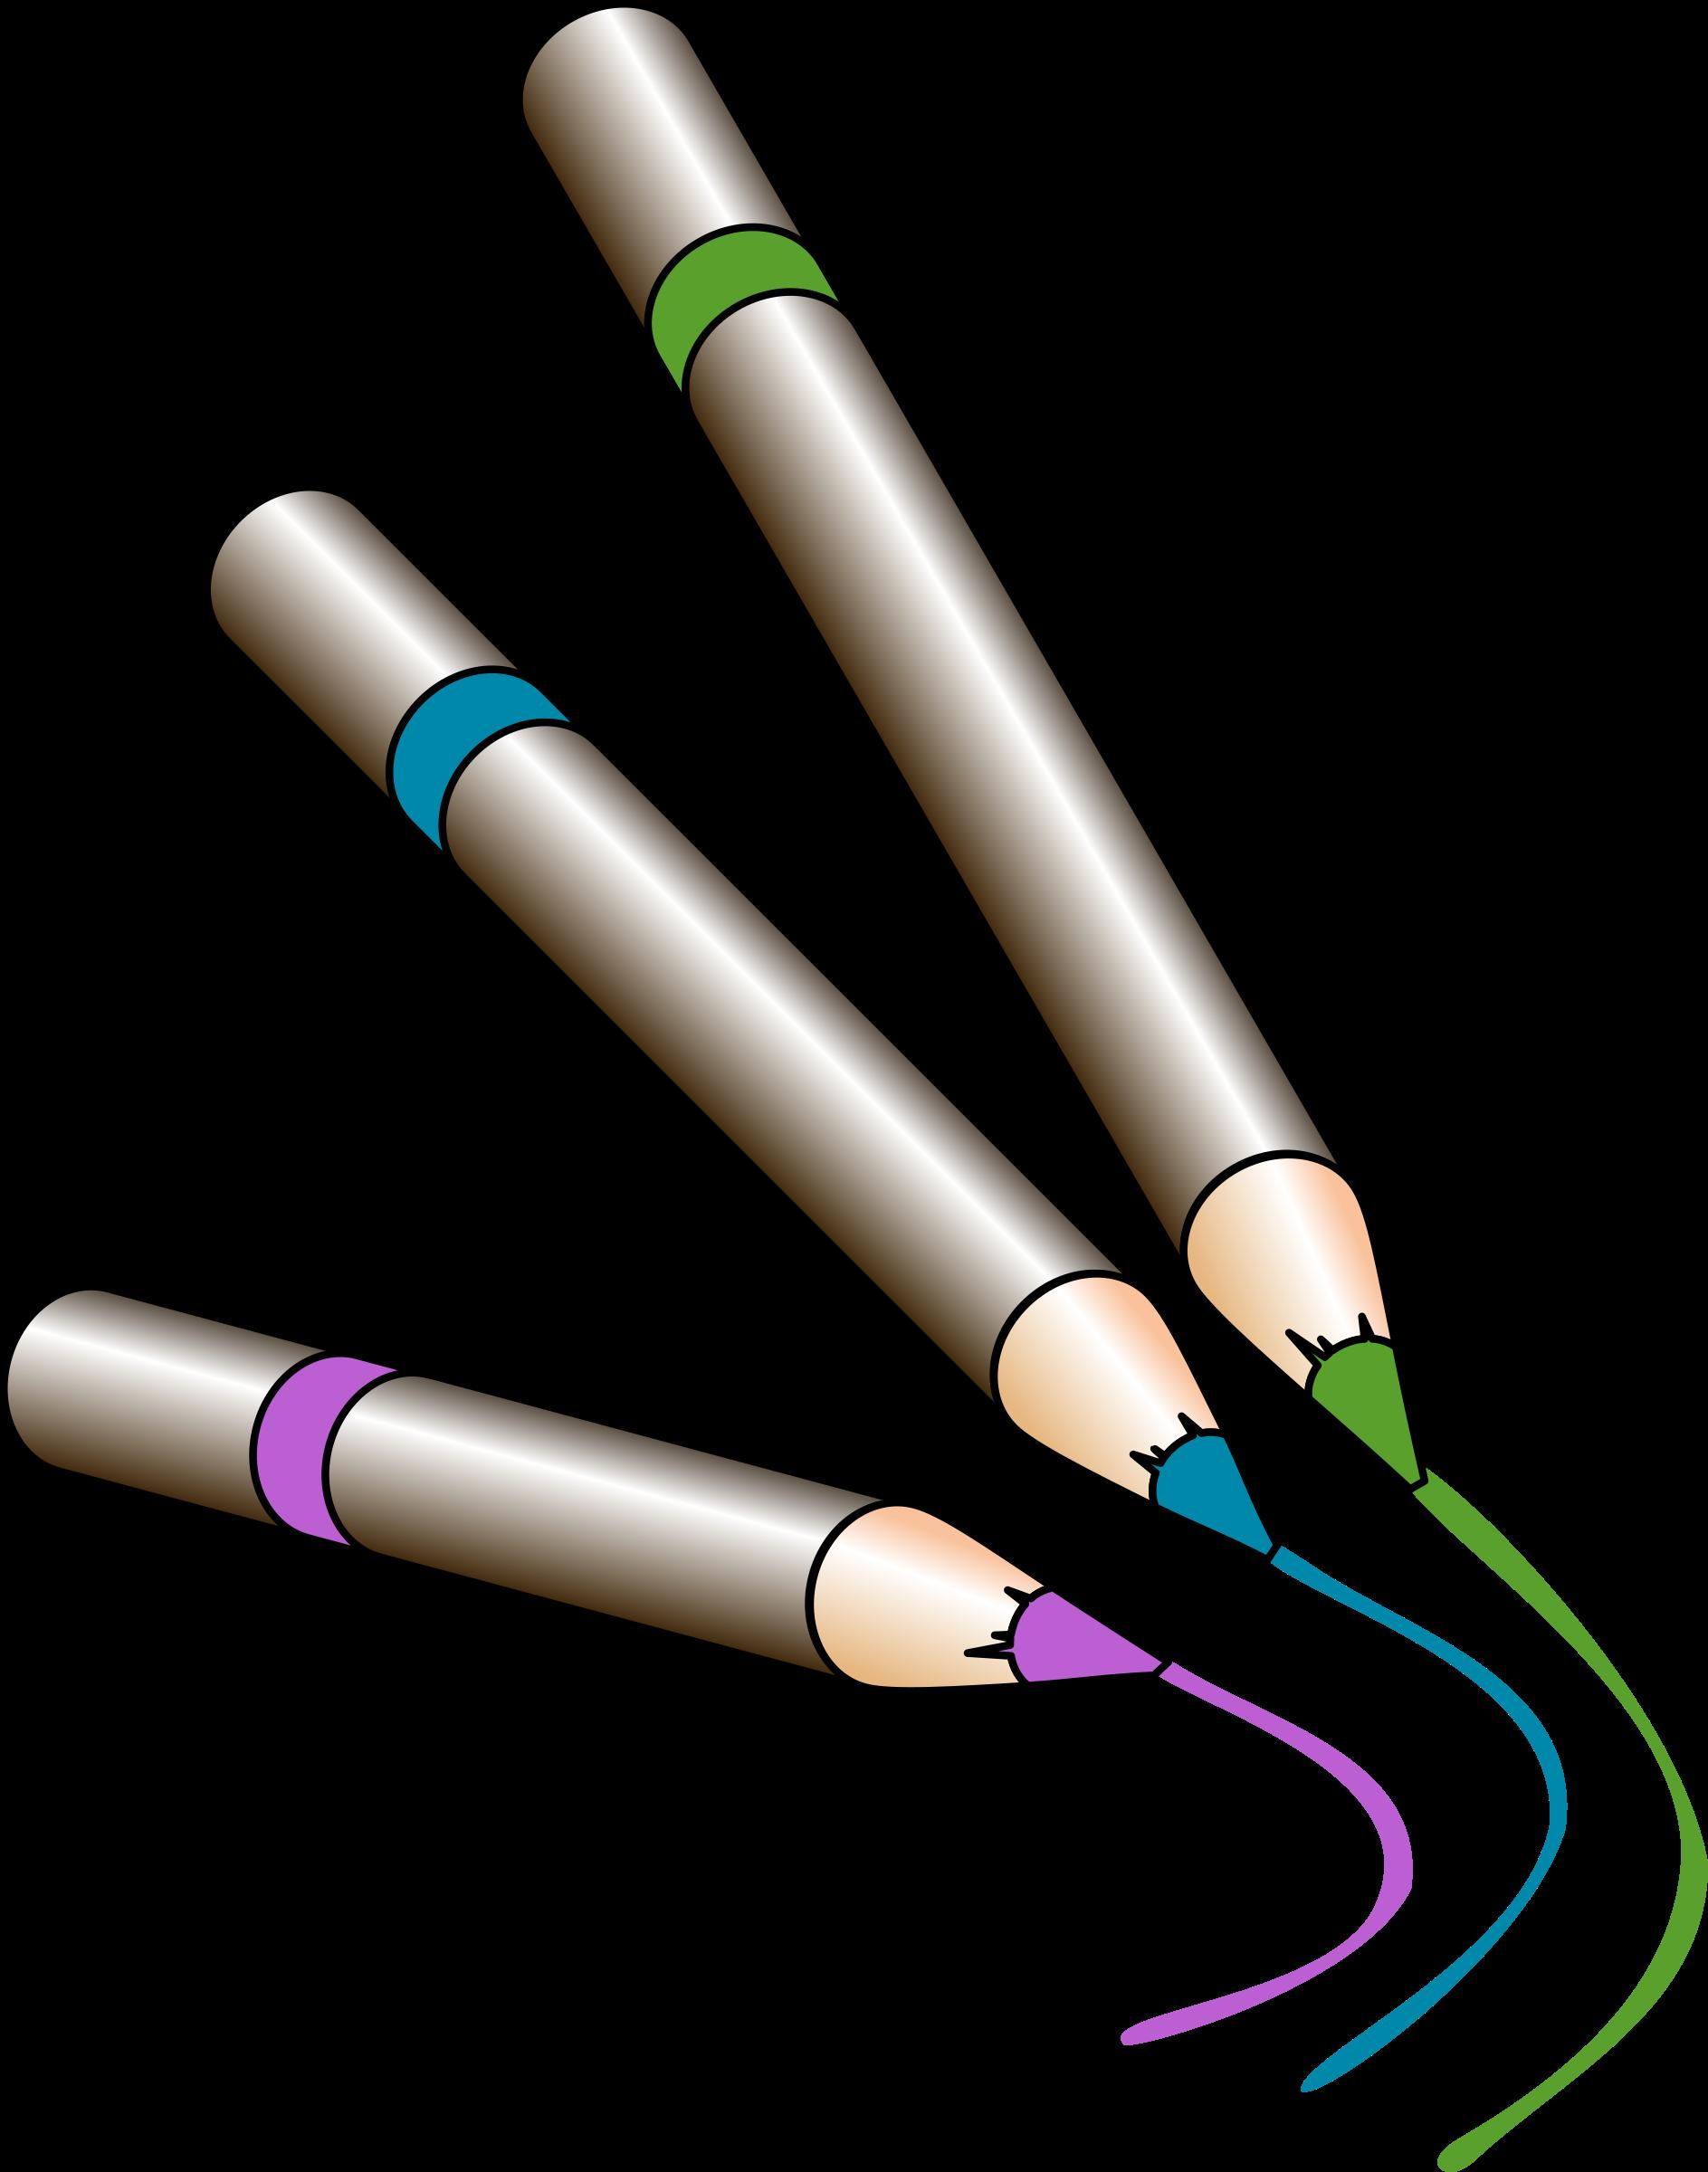 Crayons clipart big. Image png